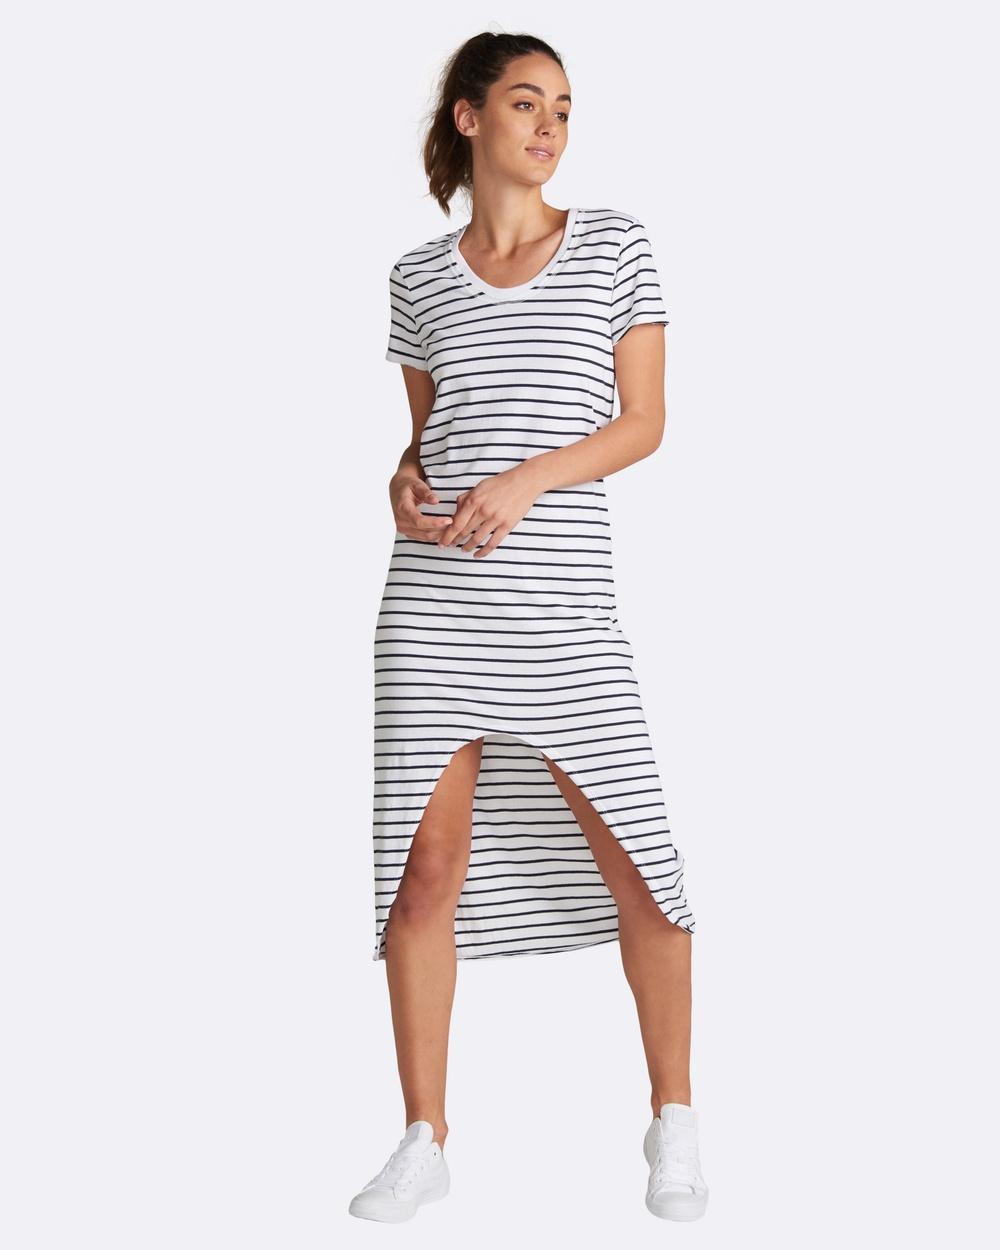 jac + mooki Maisie Stripe Dress Dresses White Maisie Stripe Dress